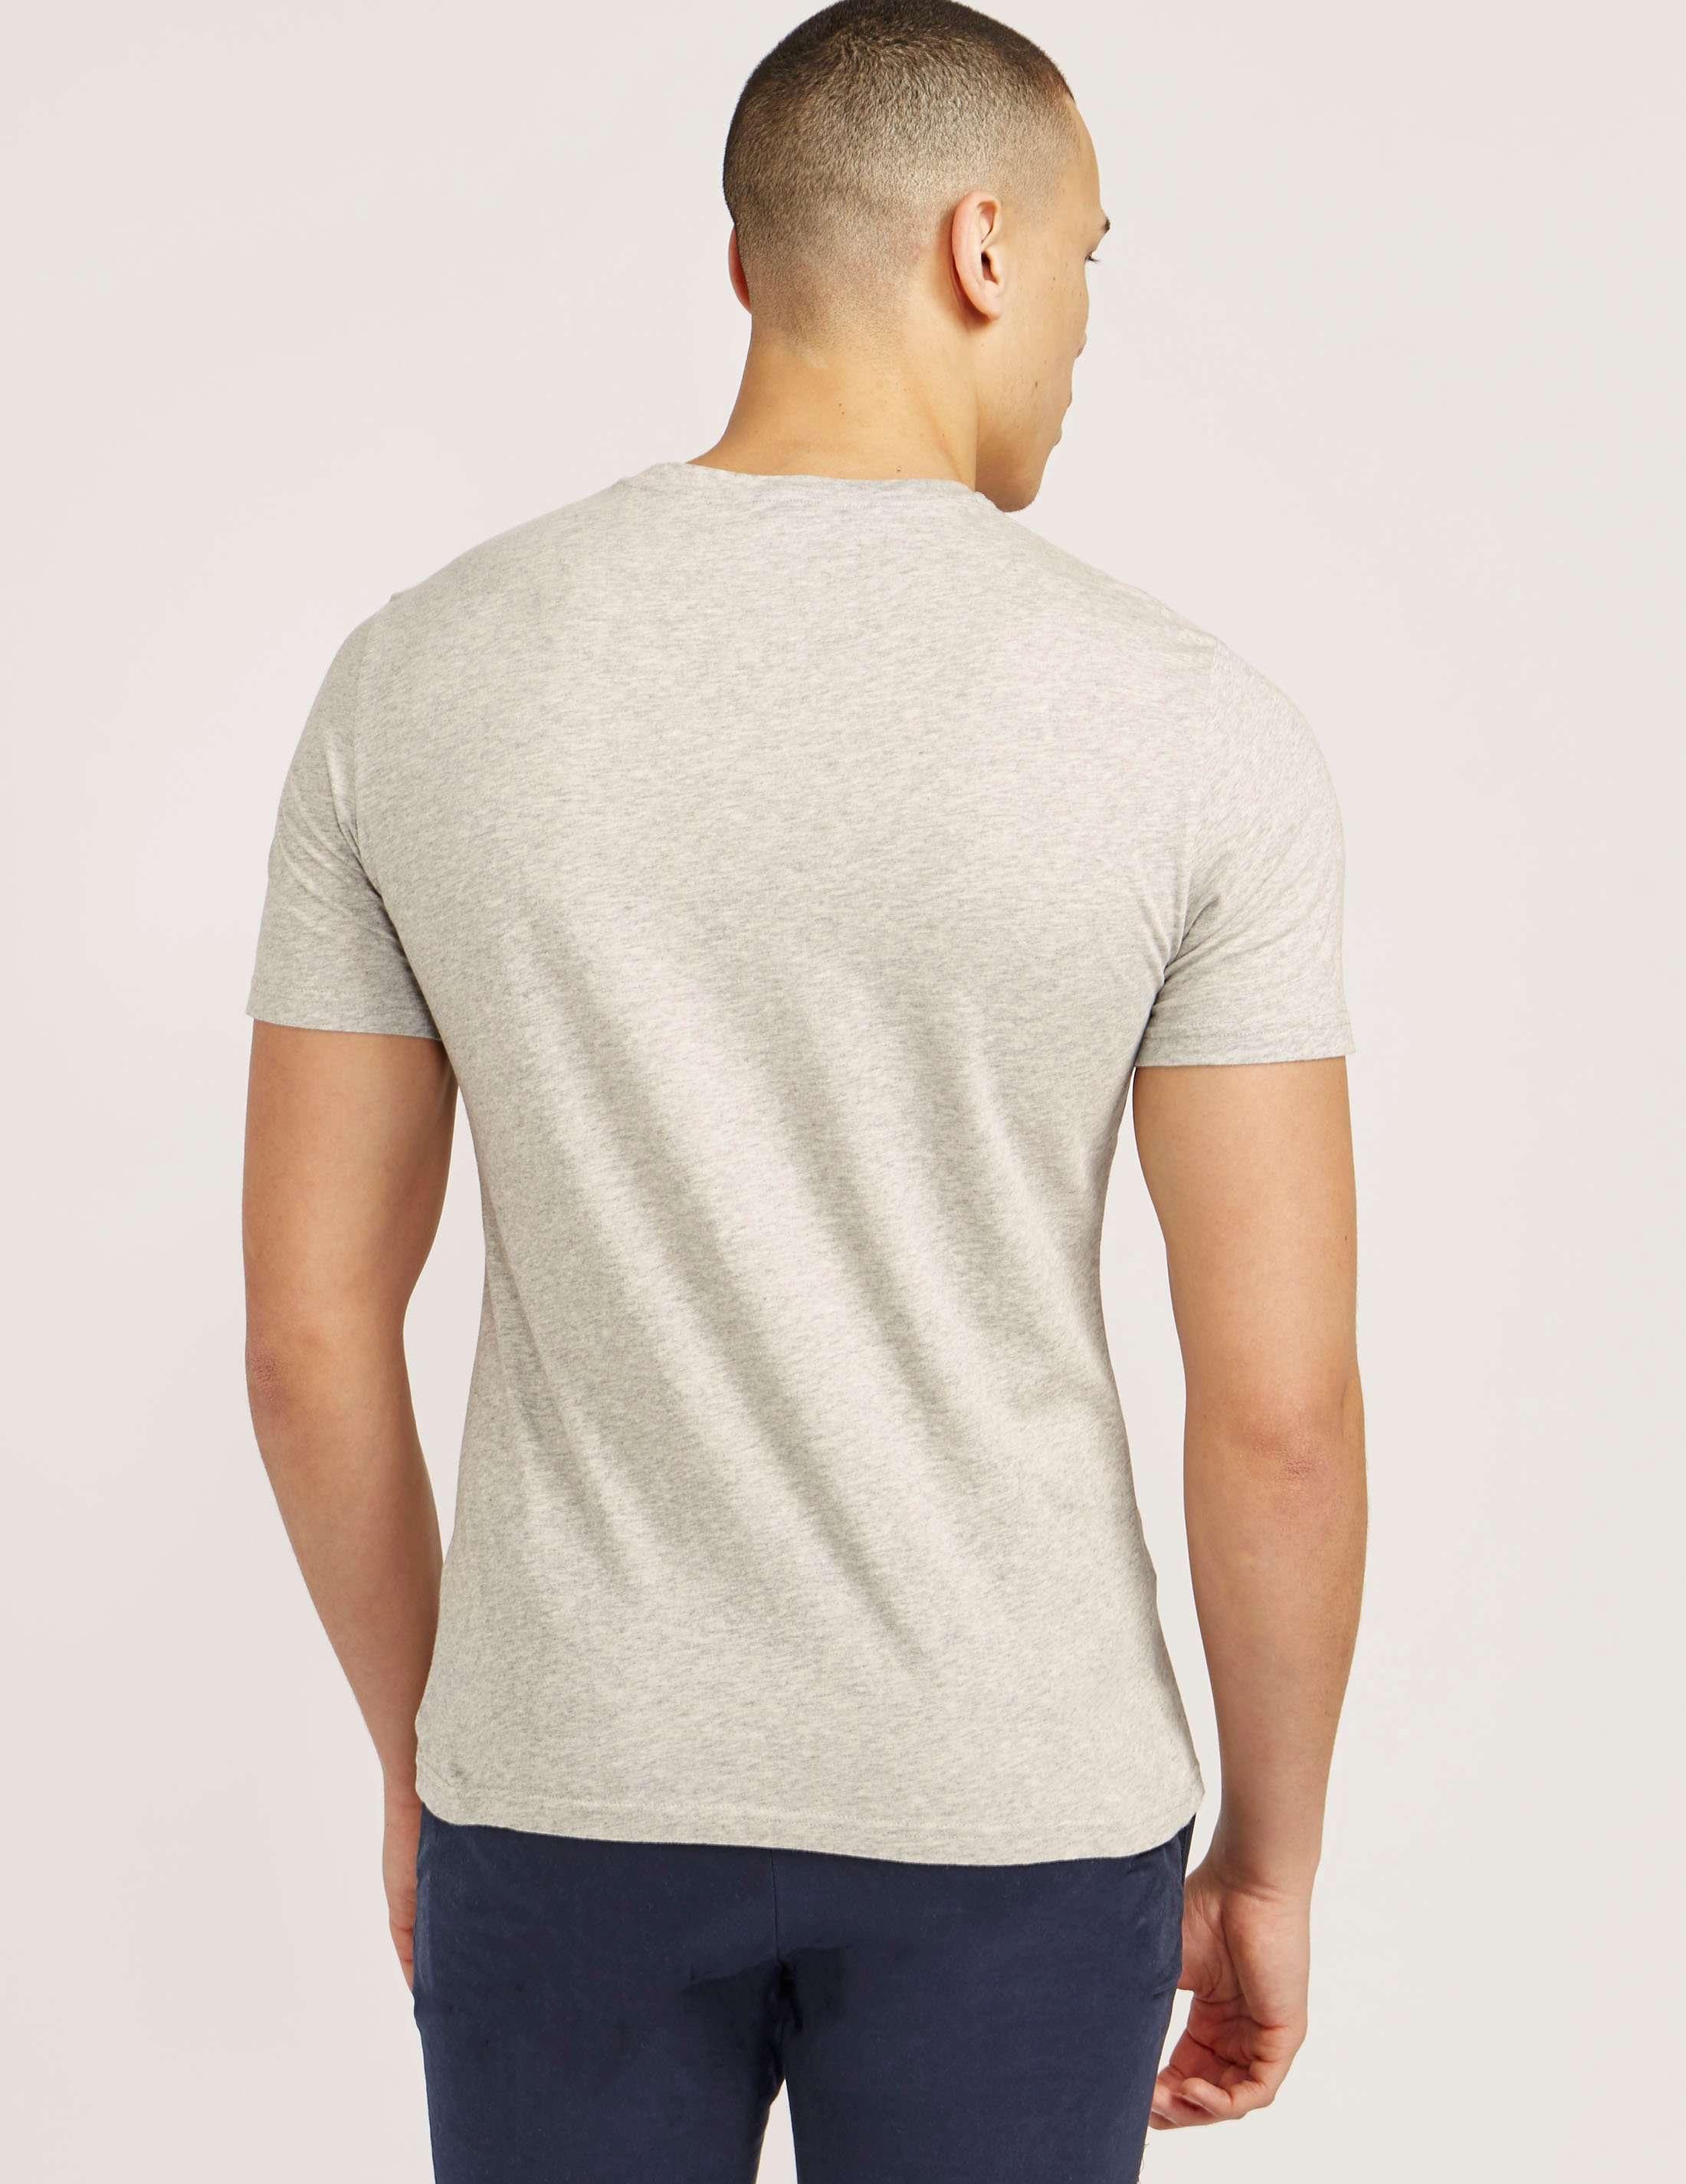 Vivienne Westwood Chest Orb T-Shirt